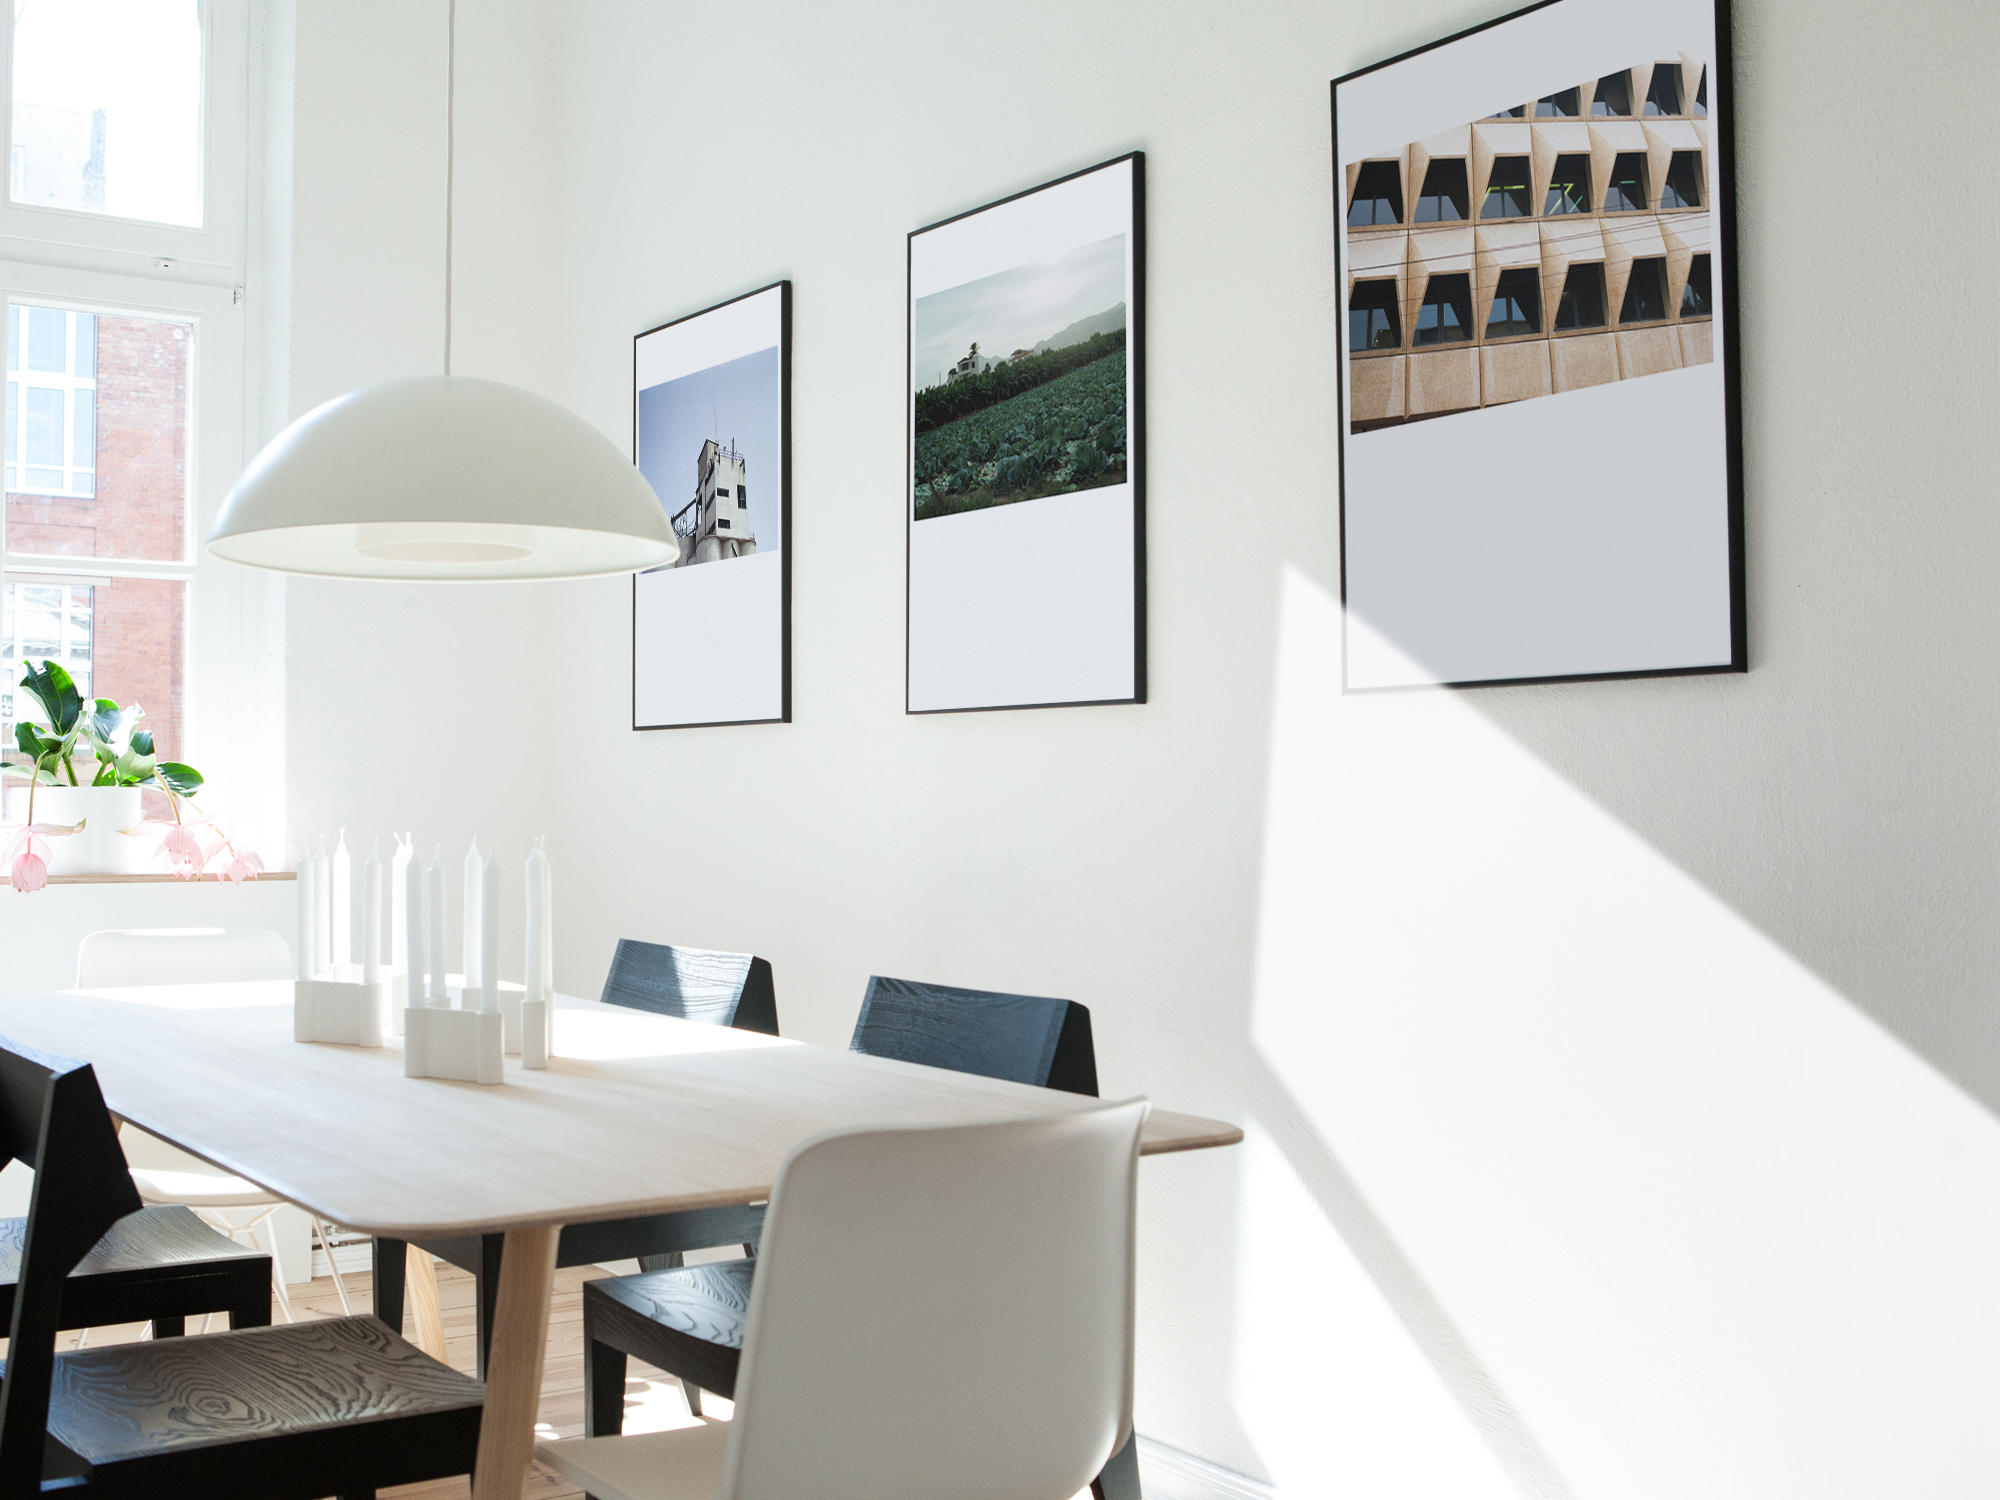 meyer m tables de repas de objekte unserer tage architonic. Black Bedroom Furniture Sets. Home Design Ideas